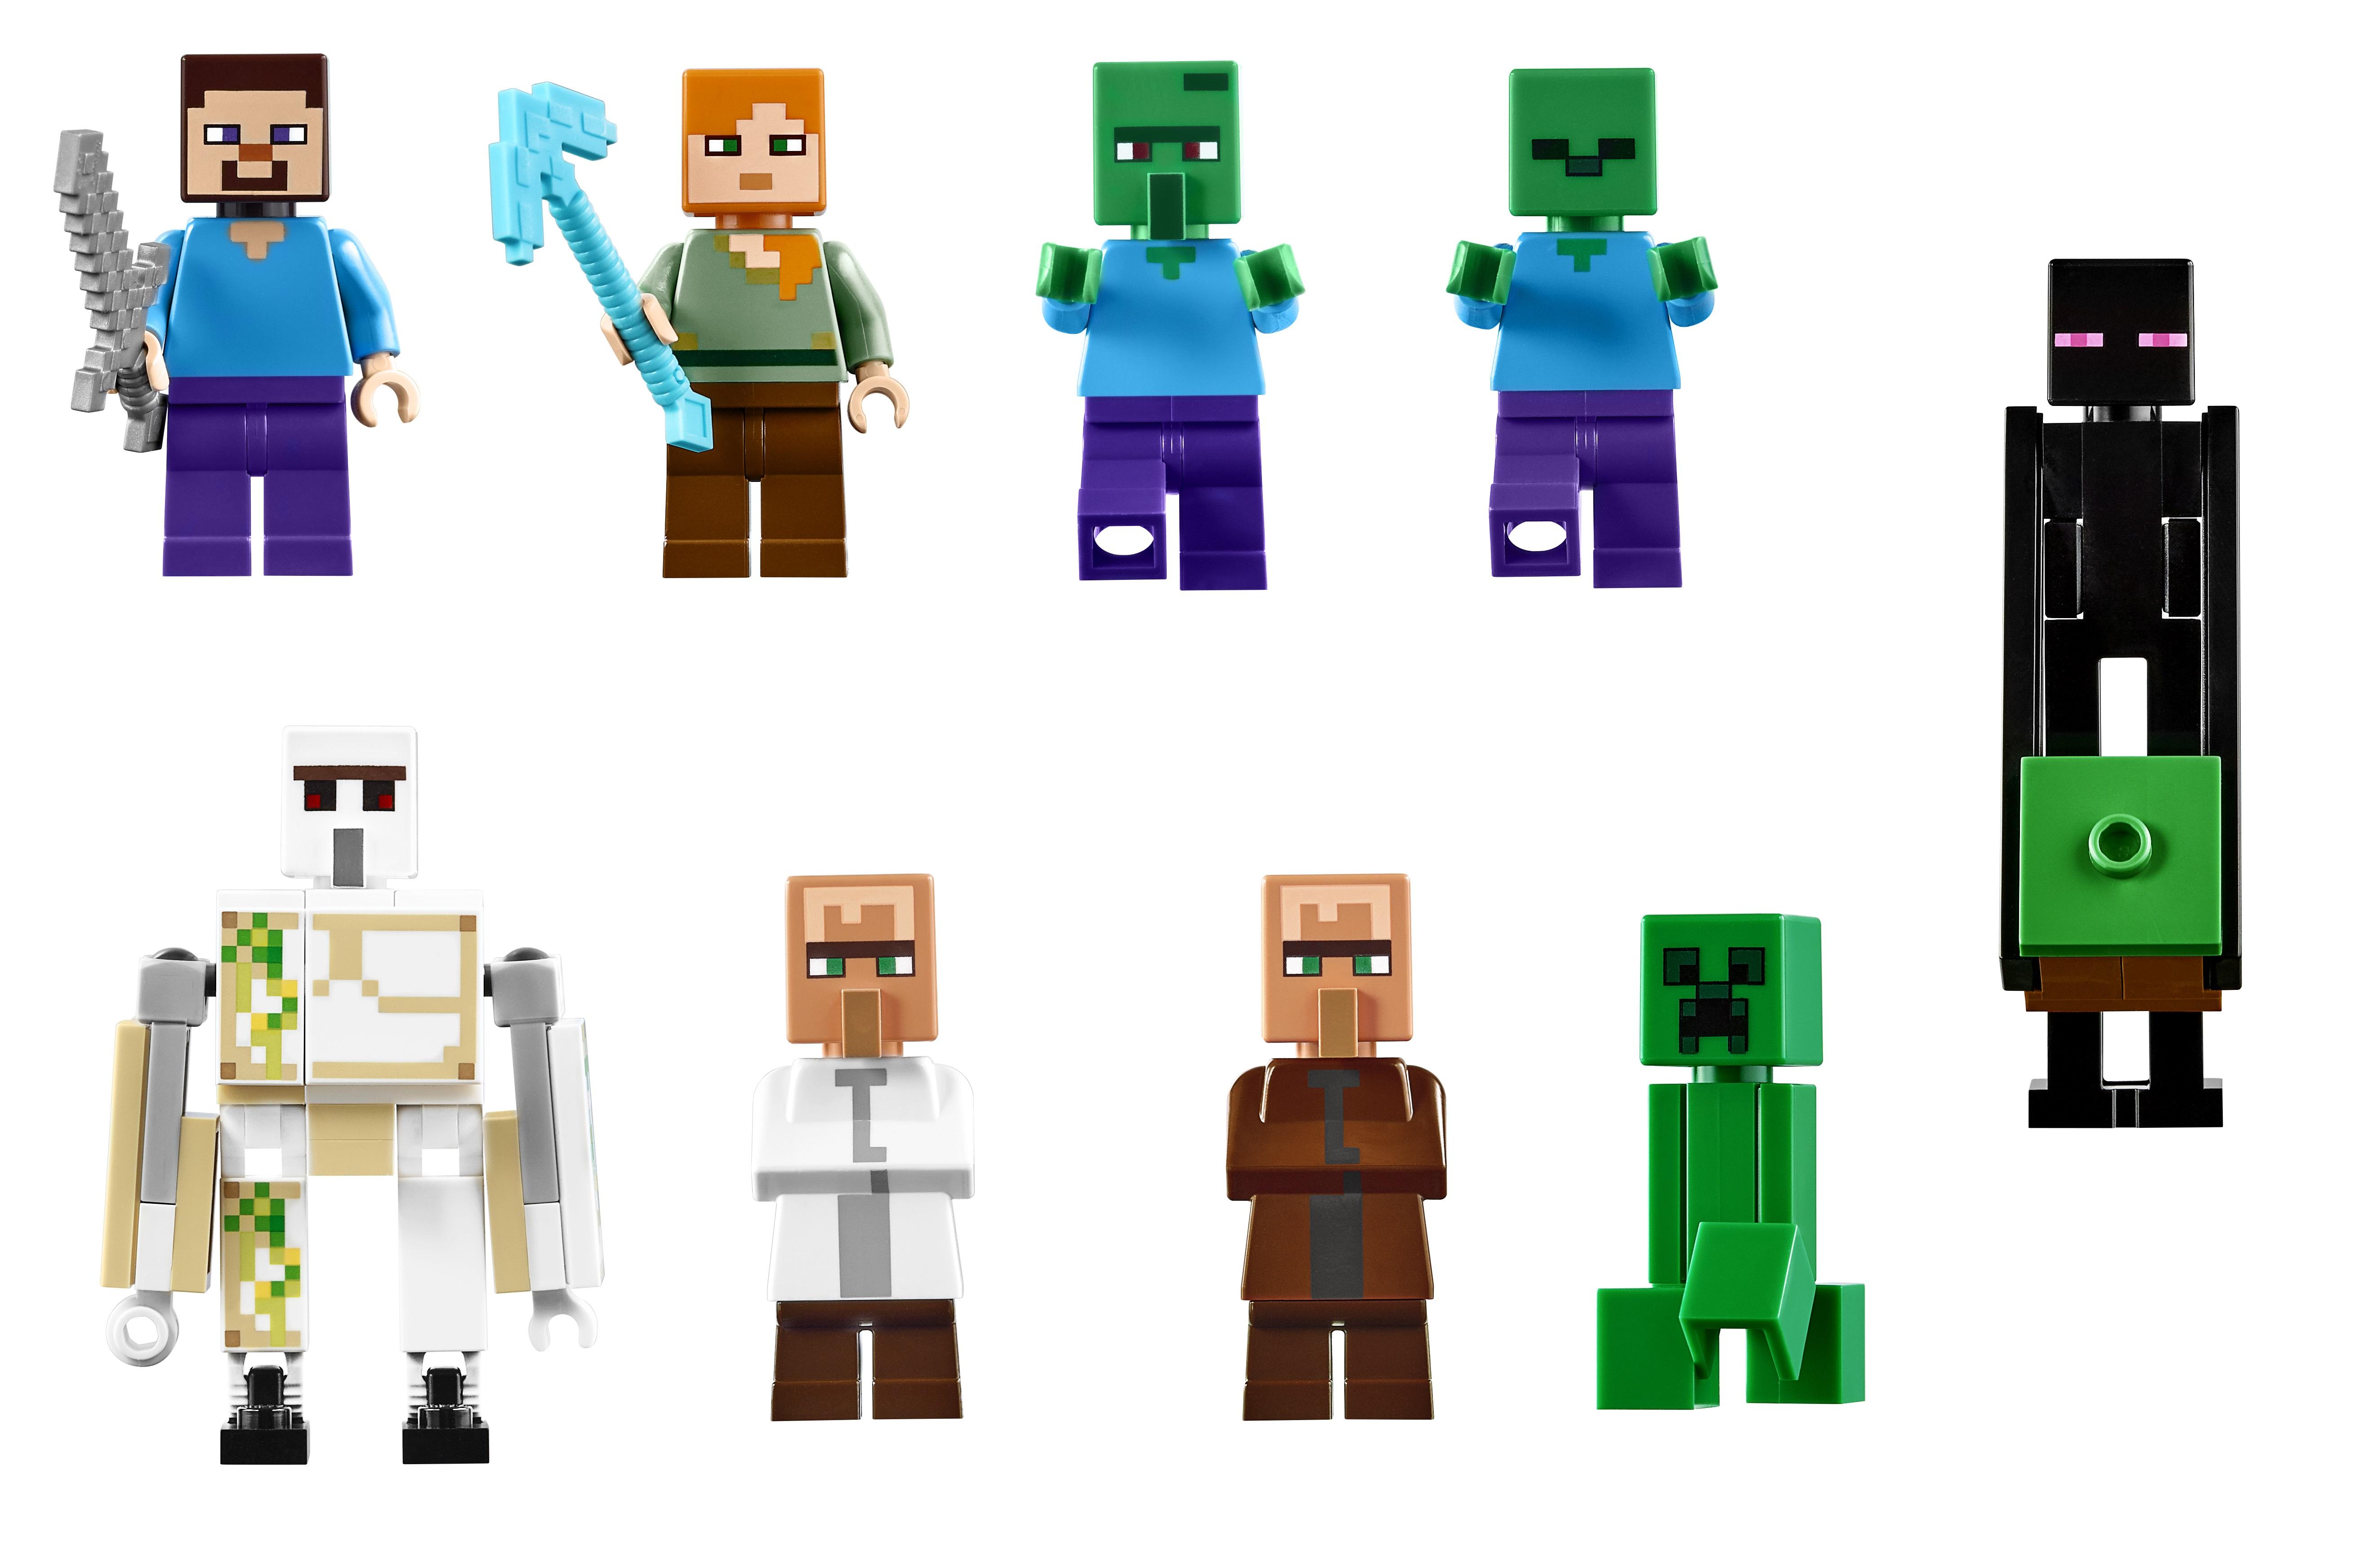 Lego Announces 21128 The Village The Largest Minecraft